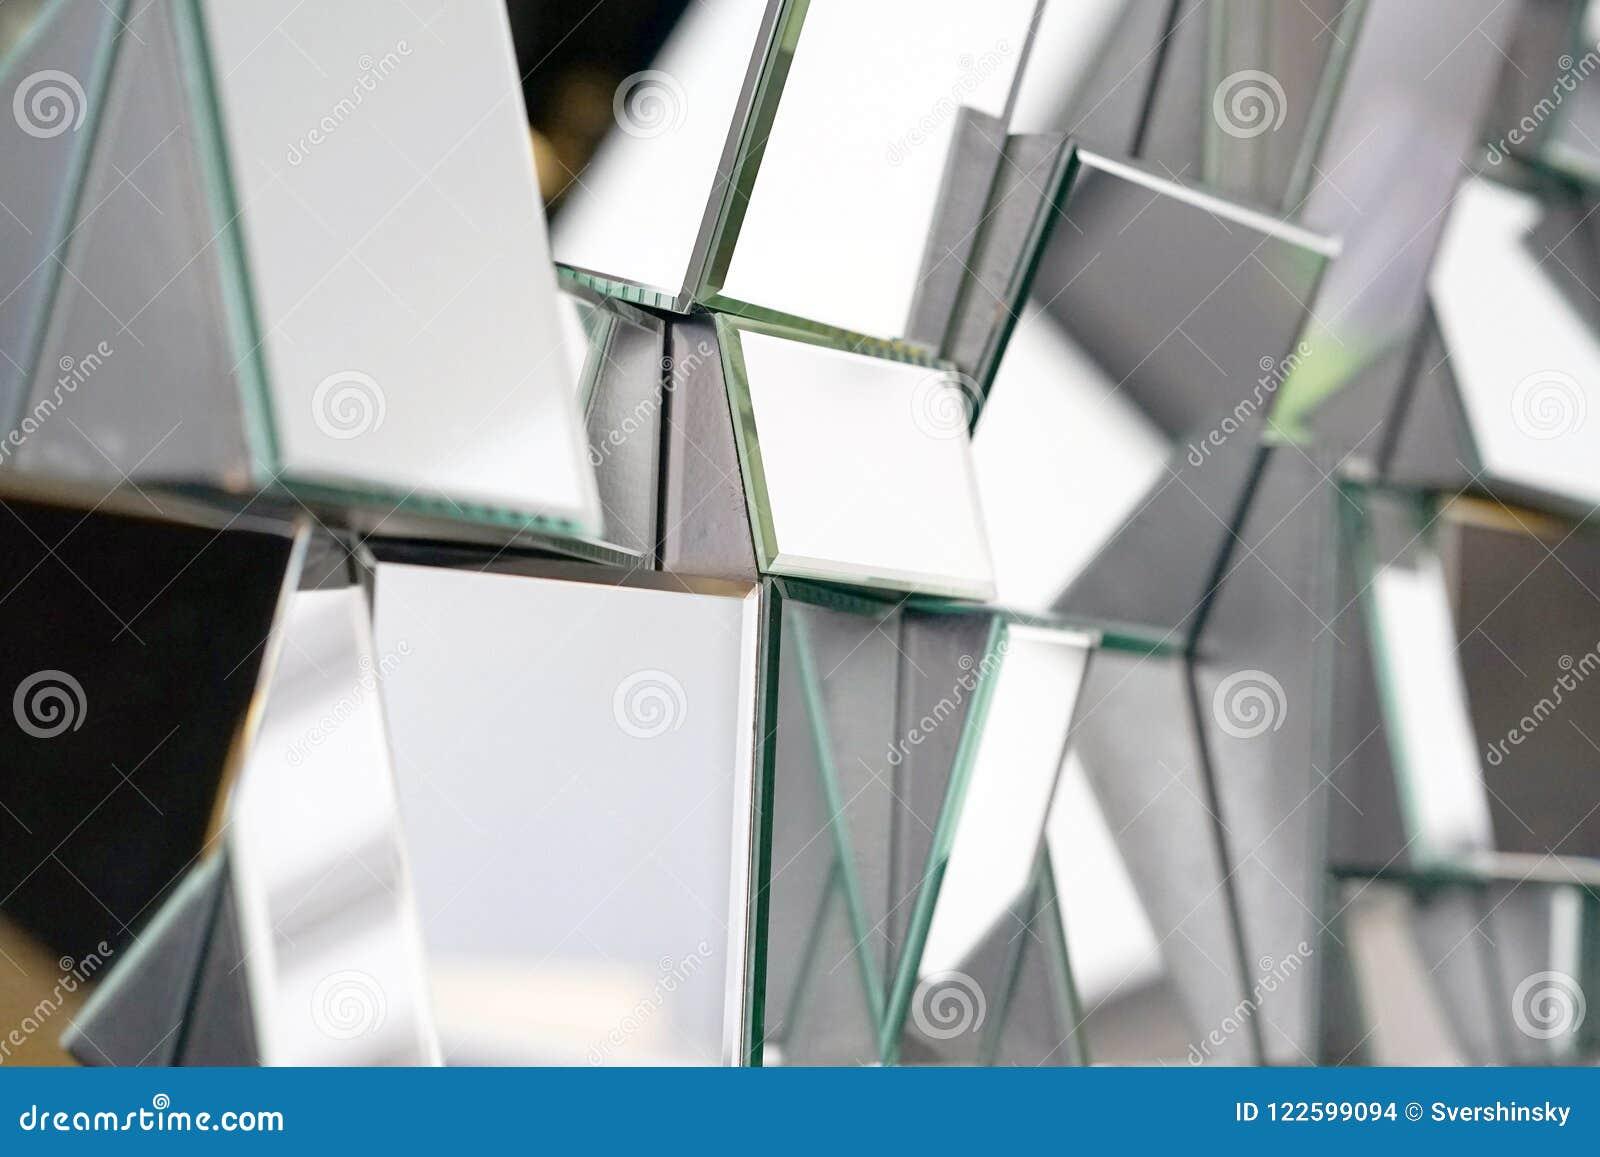 Abstrakter Spiegel Nahaufnahme